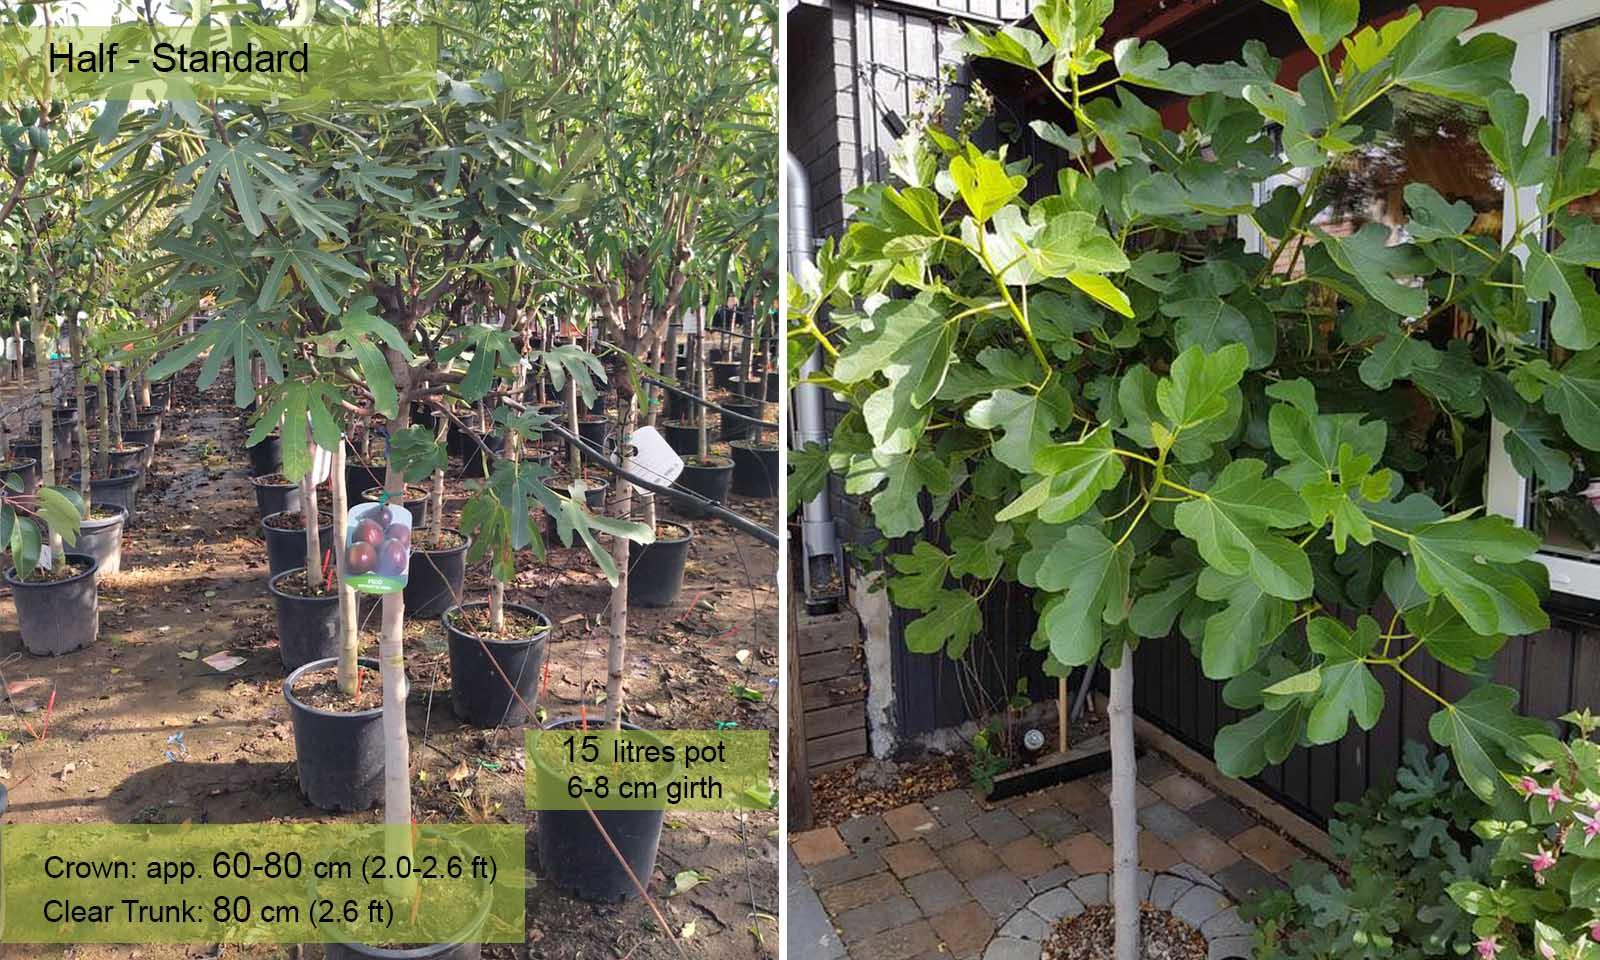 Ficus Carica Brown Turkey (Edible Common Fig Tree) - Half standard